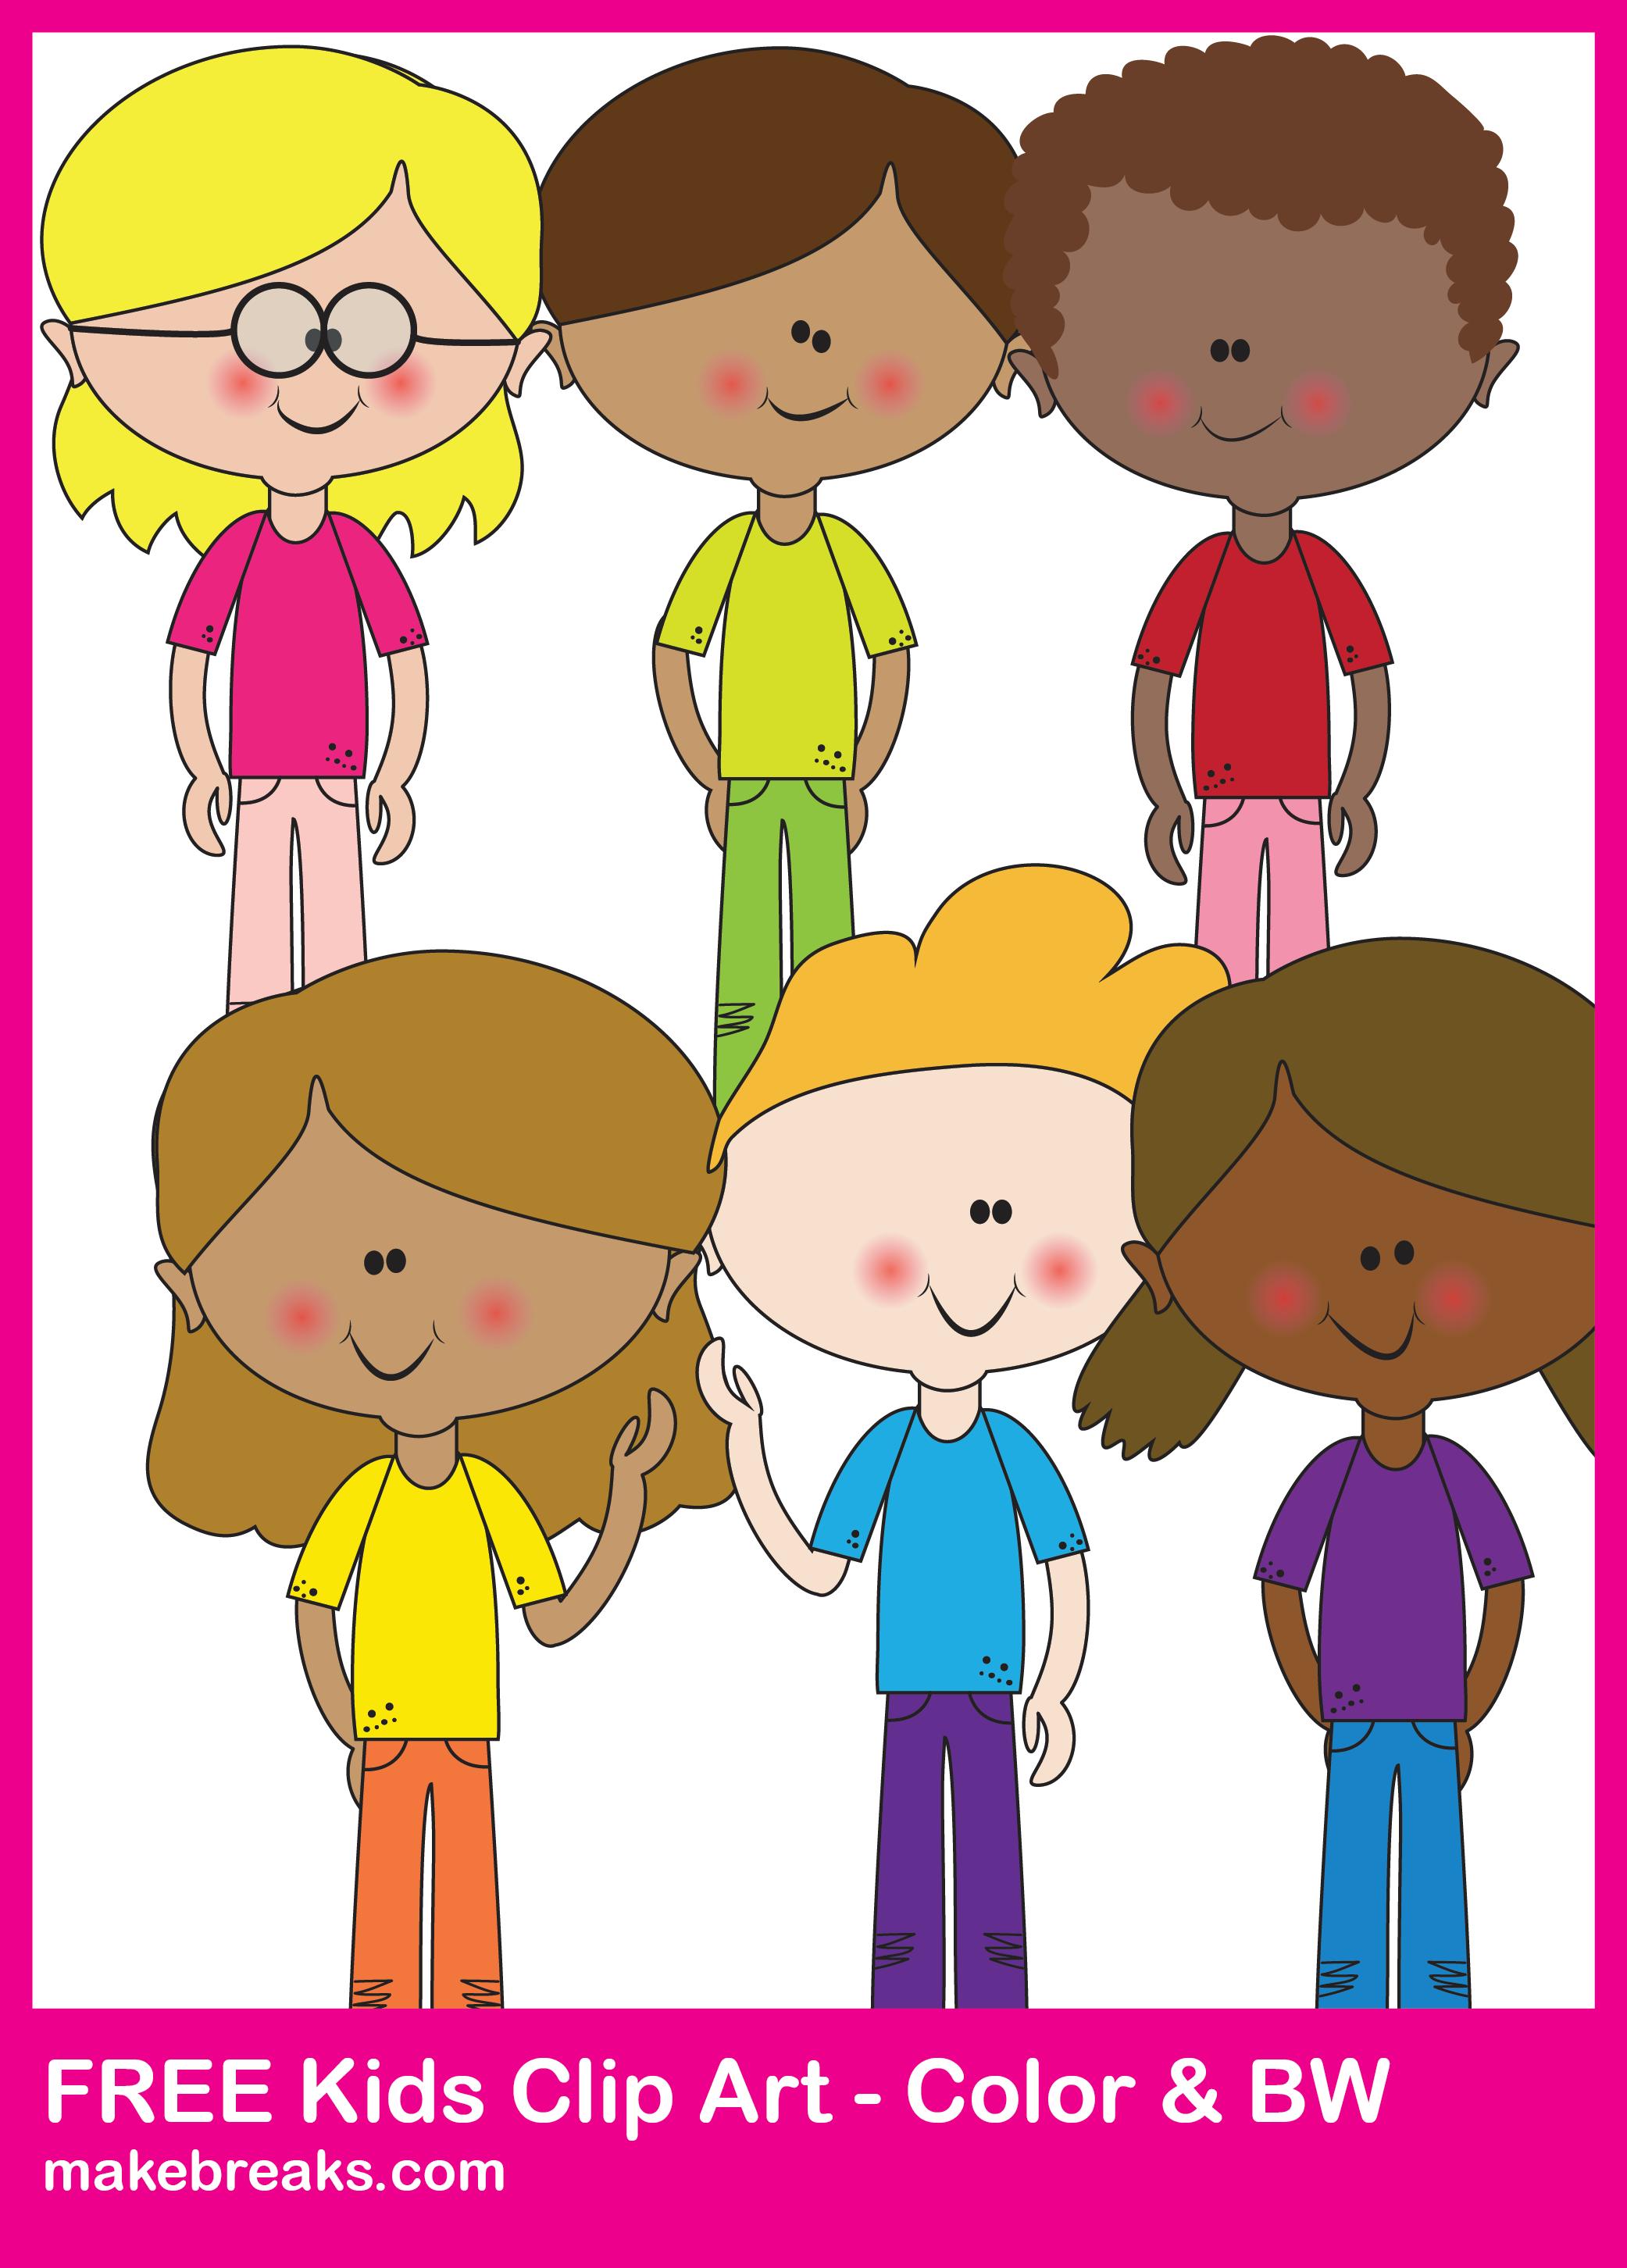 Free Cute Kids Clipart For Teachers | Classroom Printables | Digital ... clipart stock